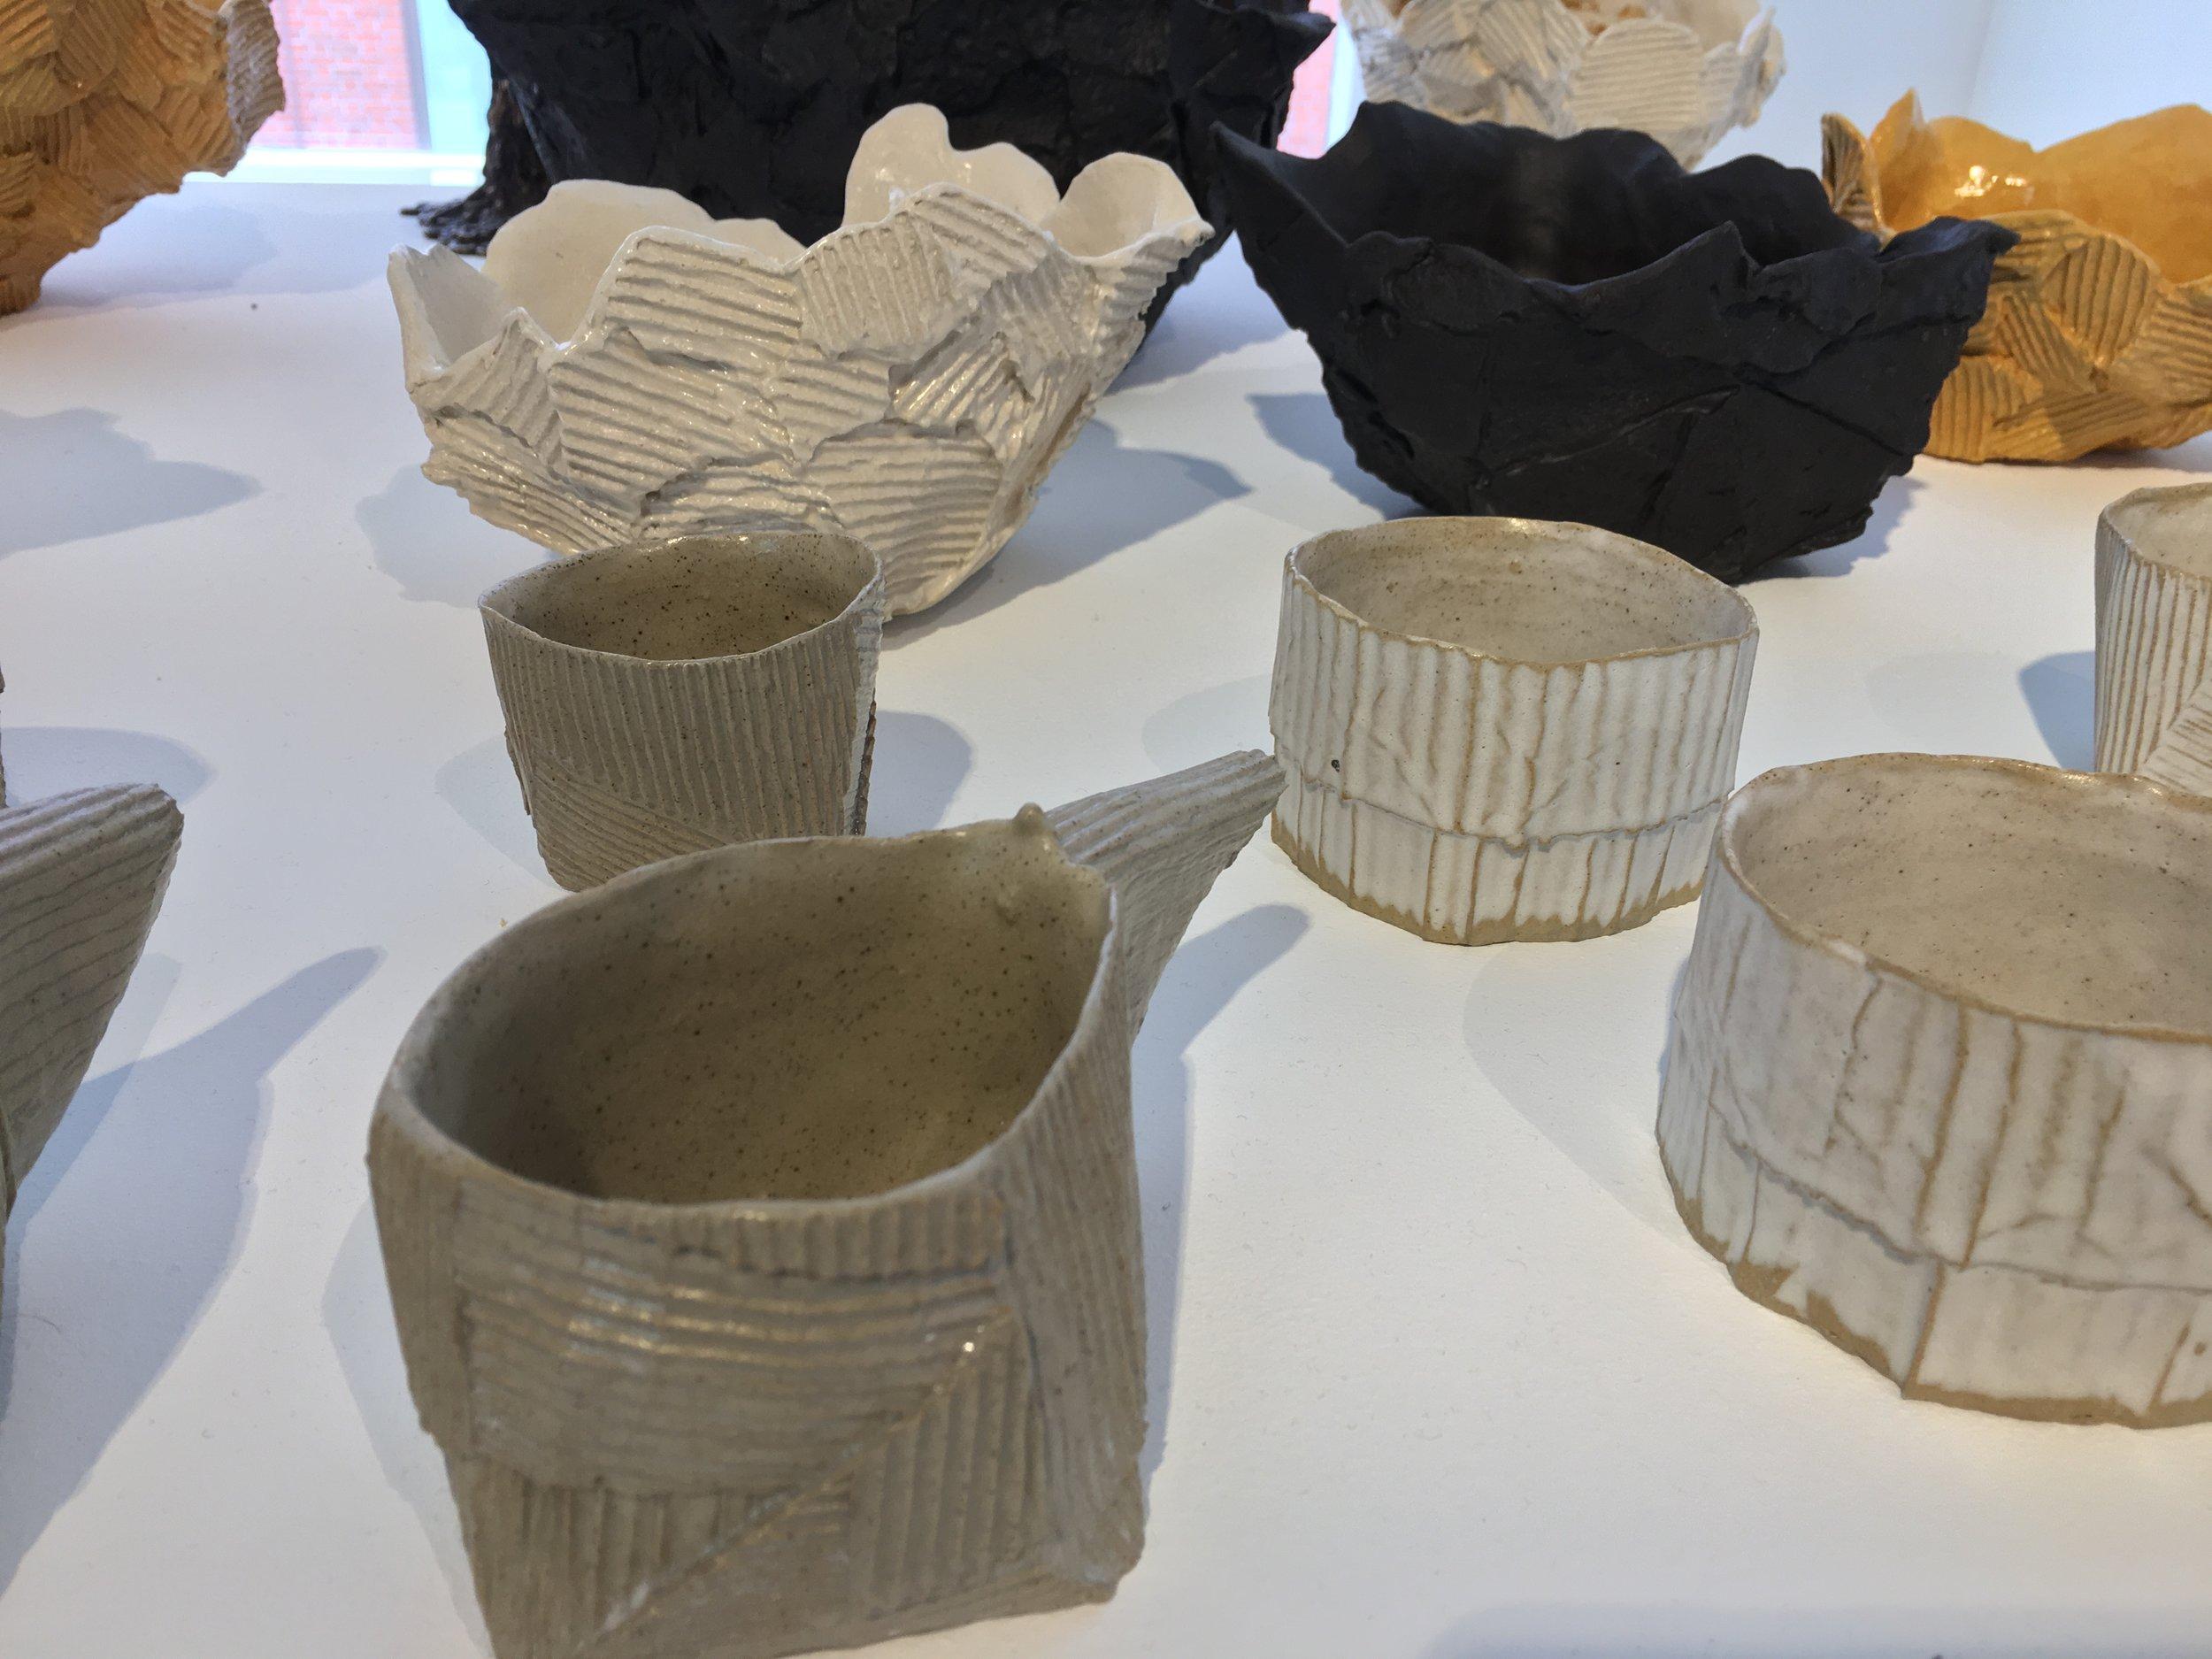 Cardboard Ceramics and Crisp Bowls, Ray G Brown